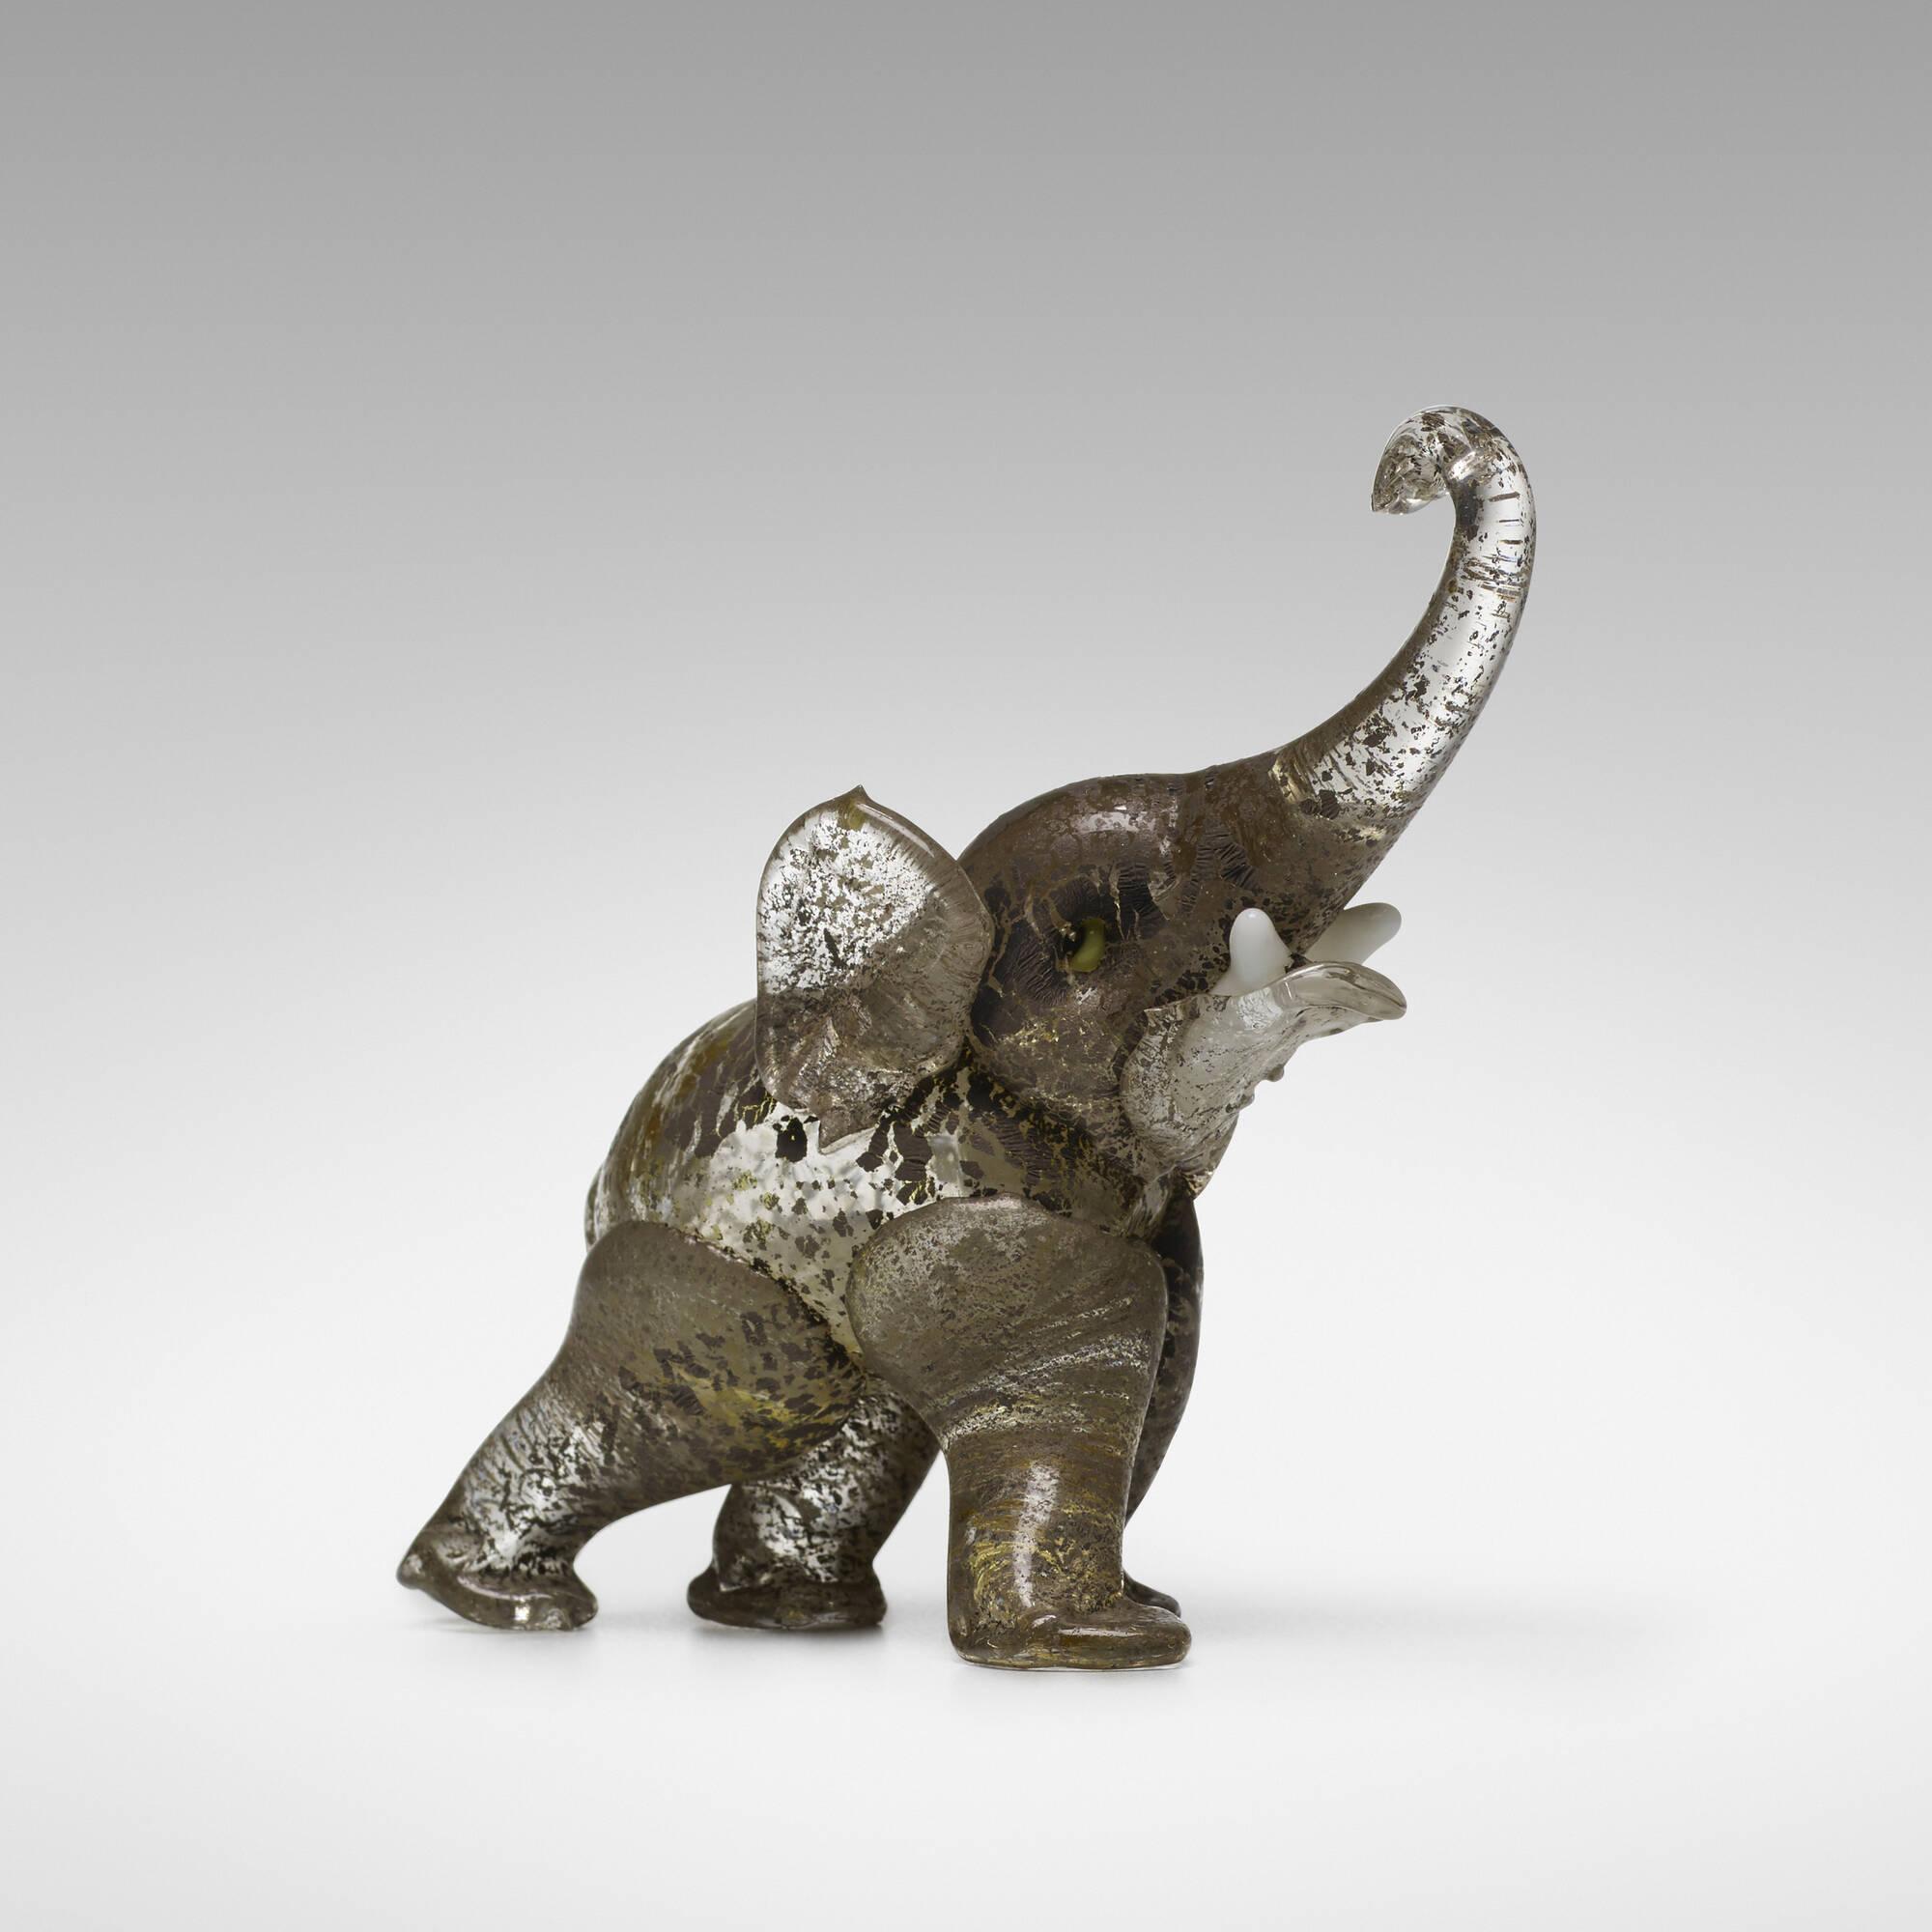 121: Ercole Barovier / Elefante (1 of 2)